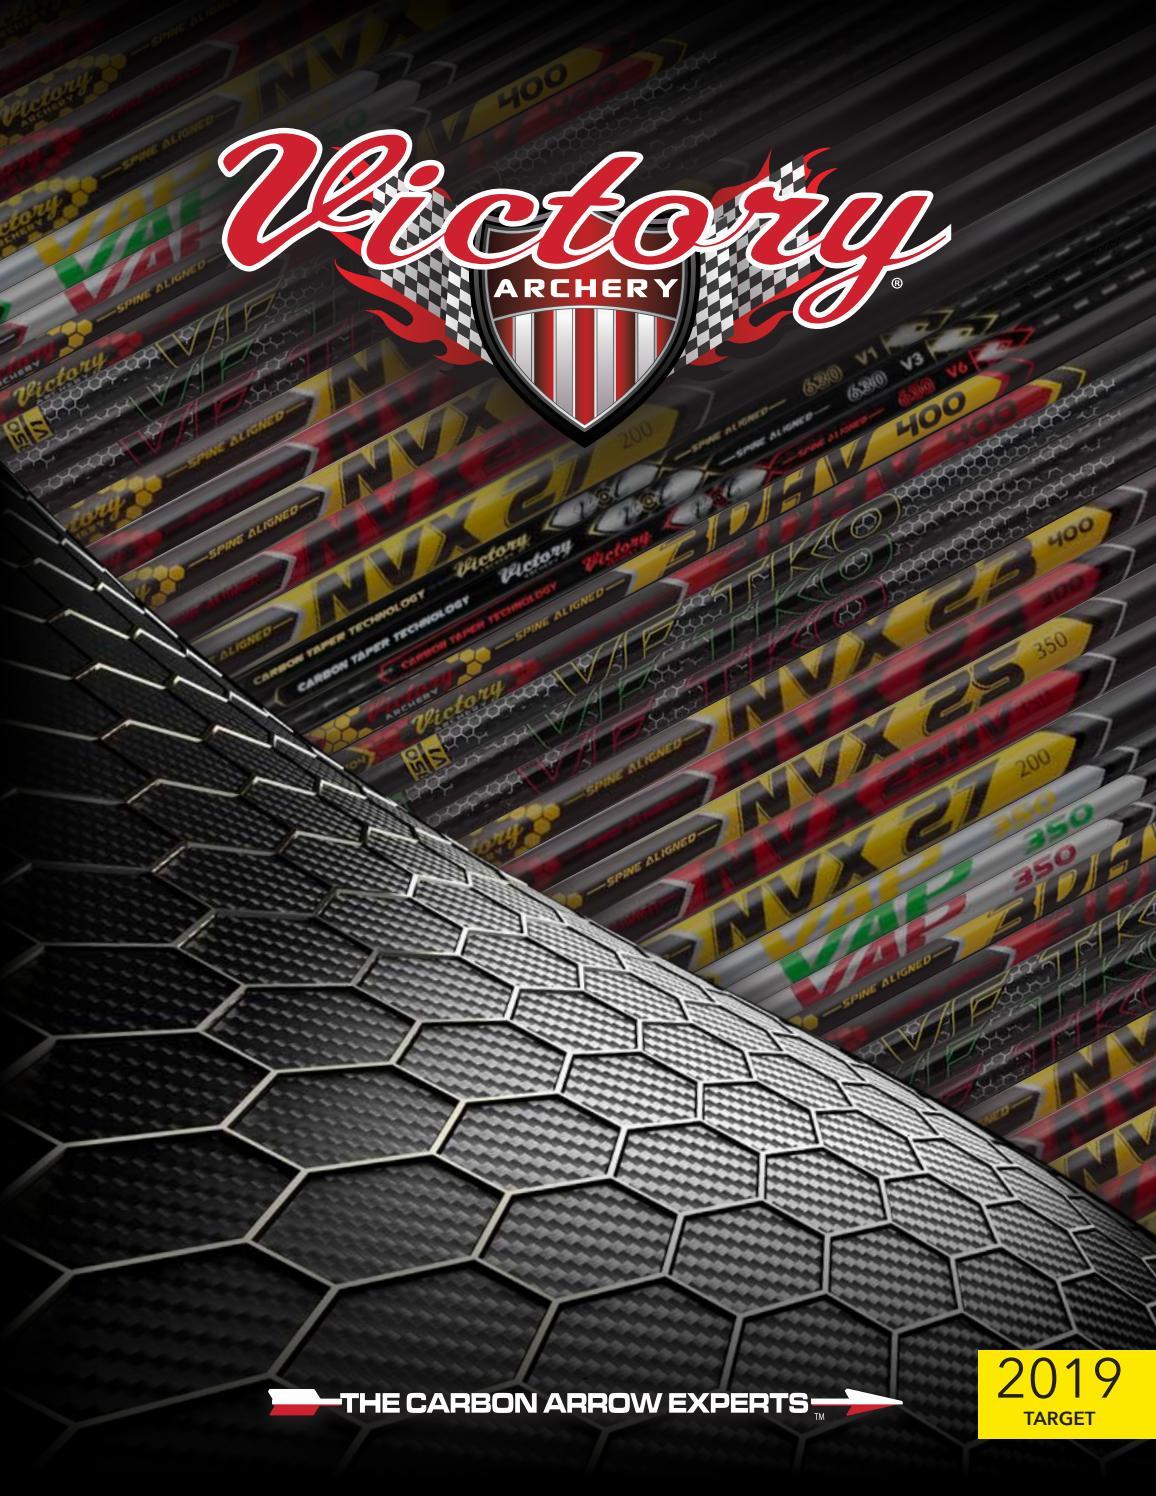 Victory Archery VForce Sport Shafts Black 300 Pack of 12